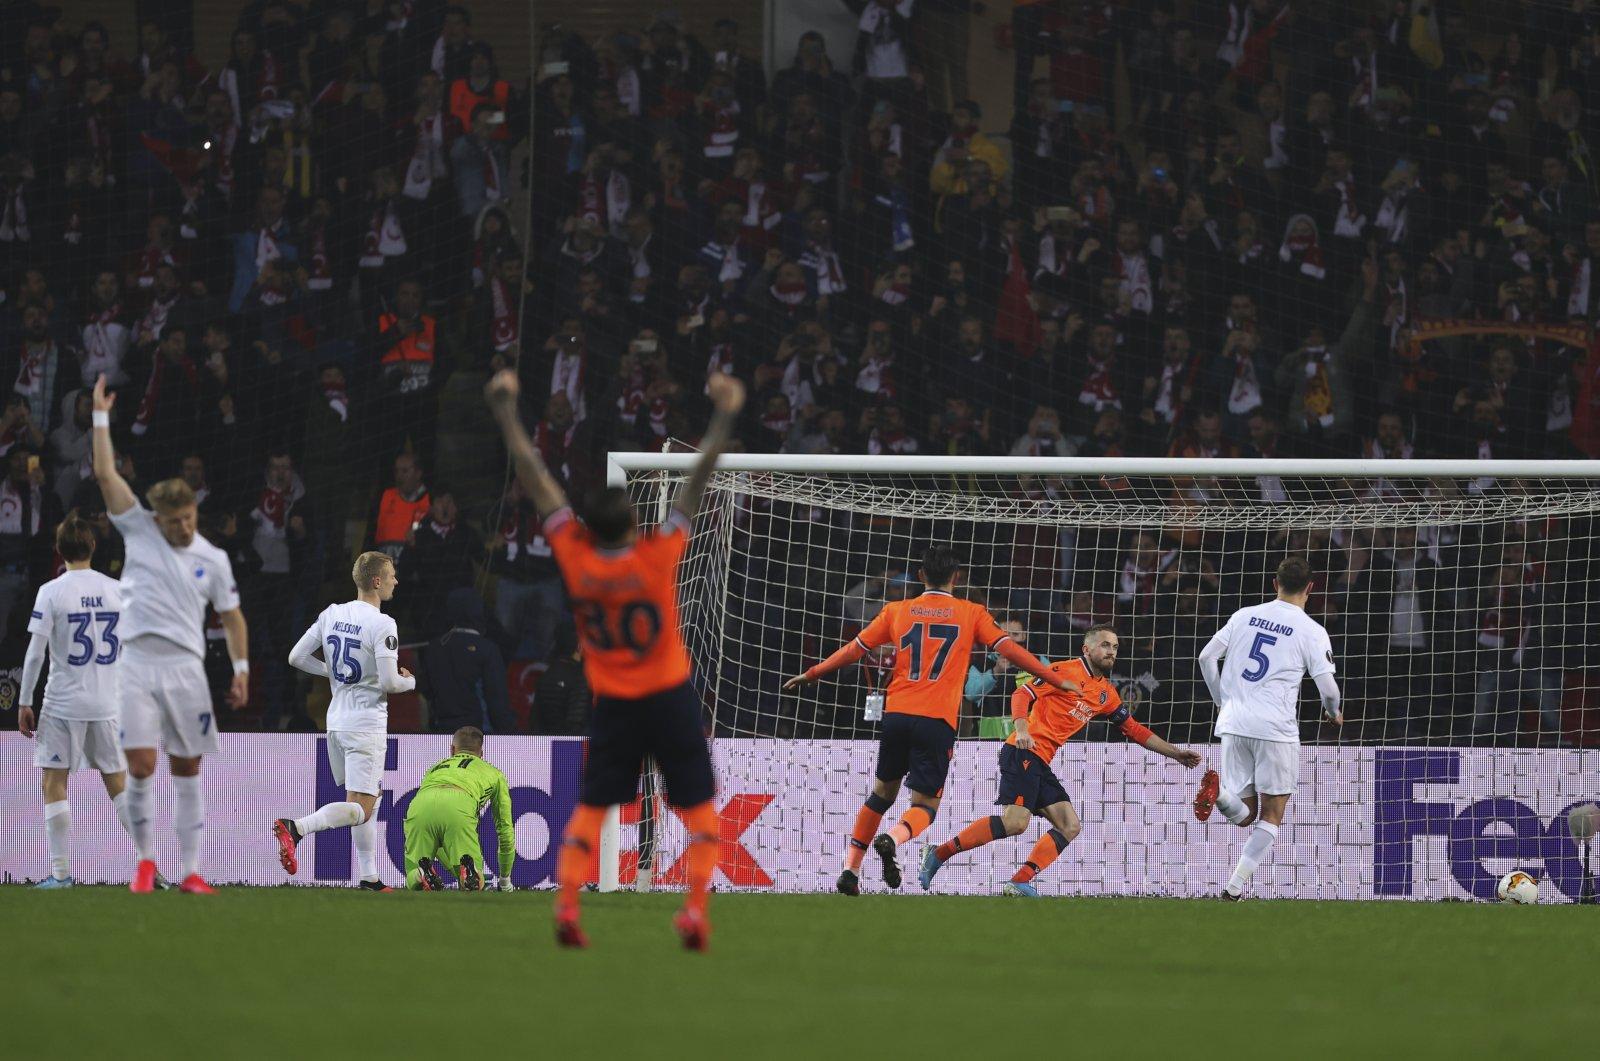 Başakşehir players celebrate Edin Visca's penalty goal against Copenhagen in a Europea League match, Istanbul, March 12, 2020. (AP Photo)